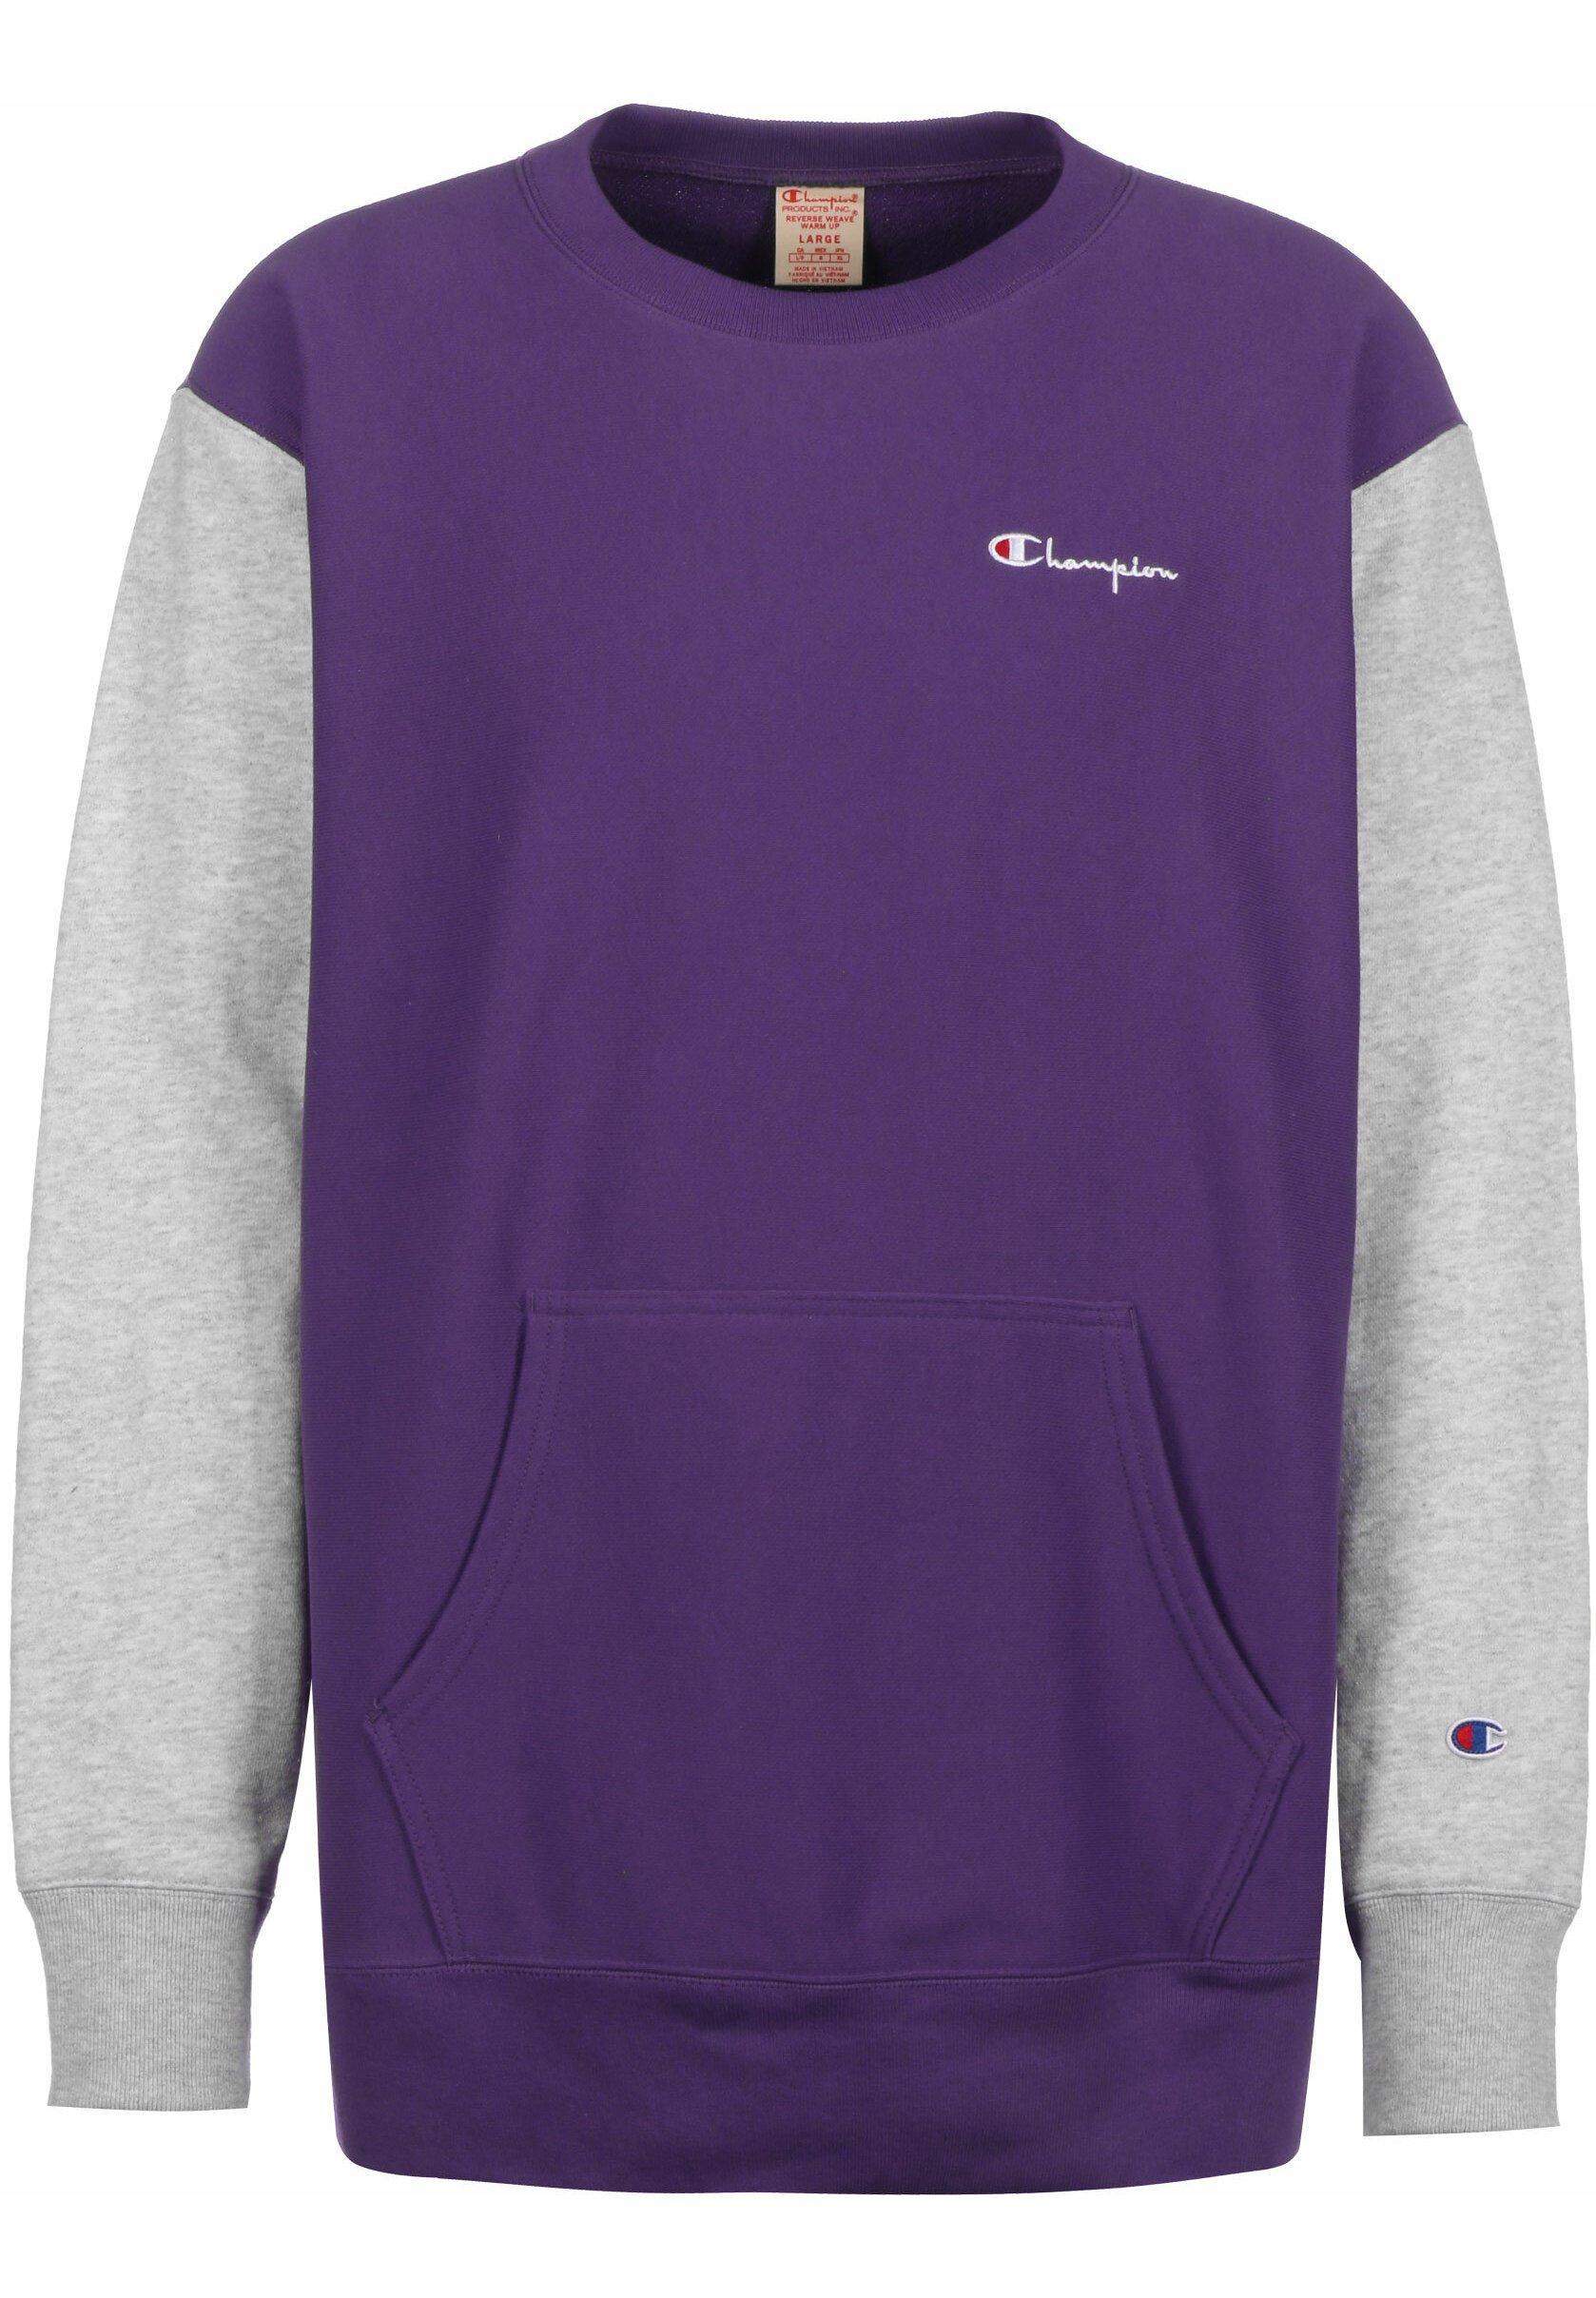 Sweatshirt prploxgm